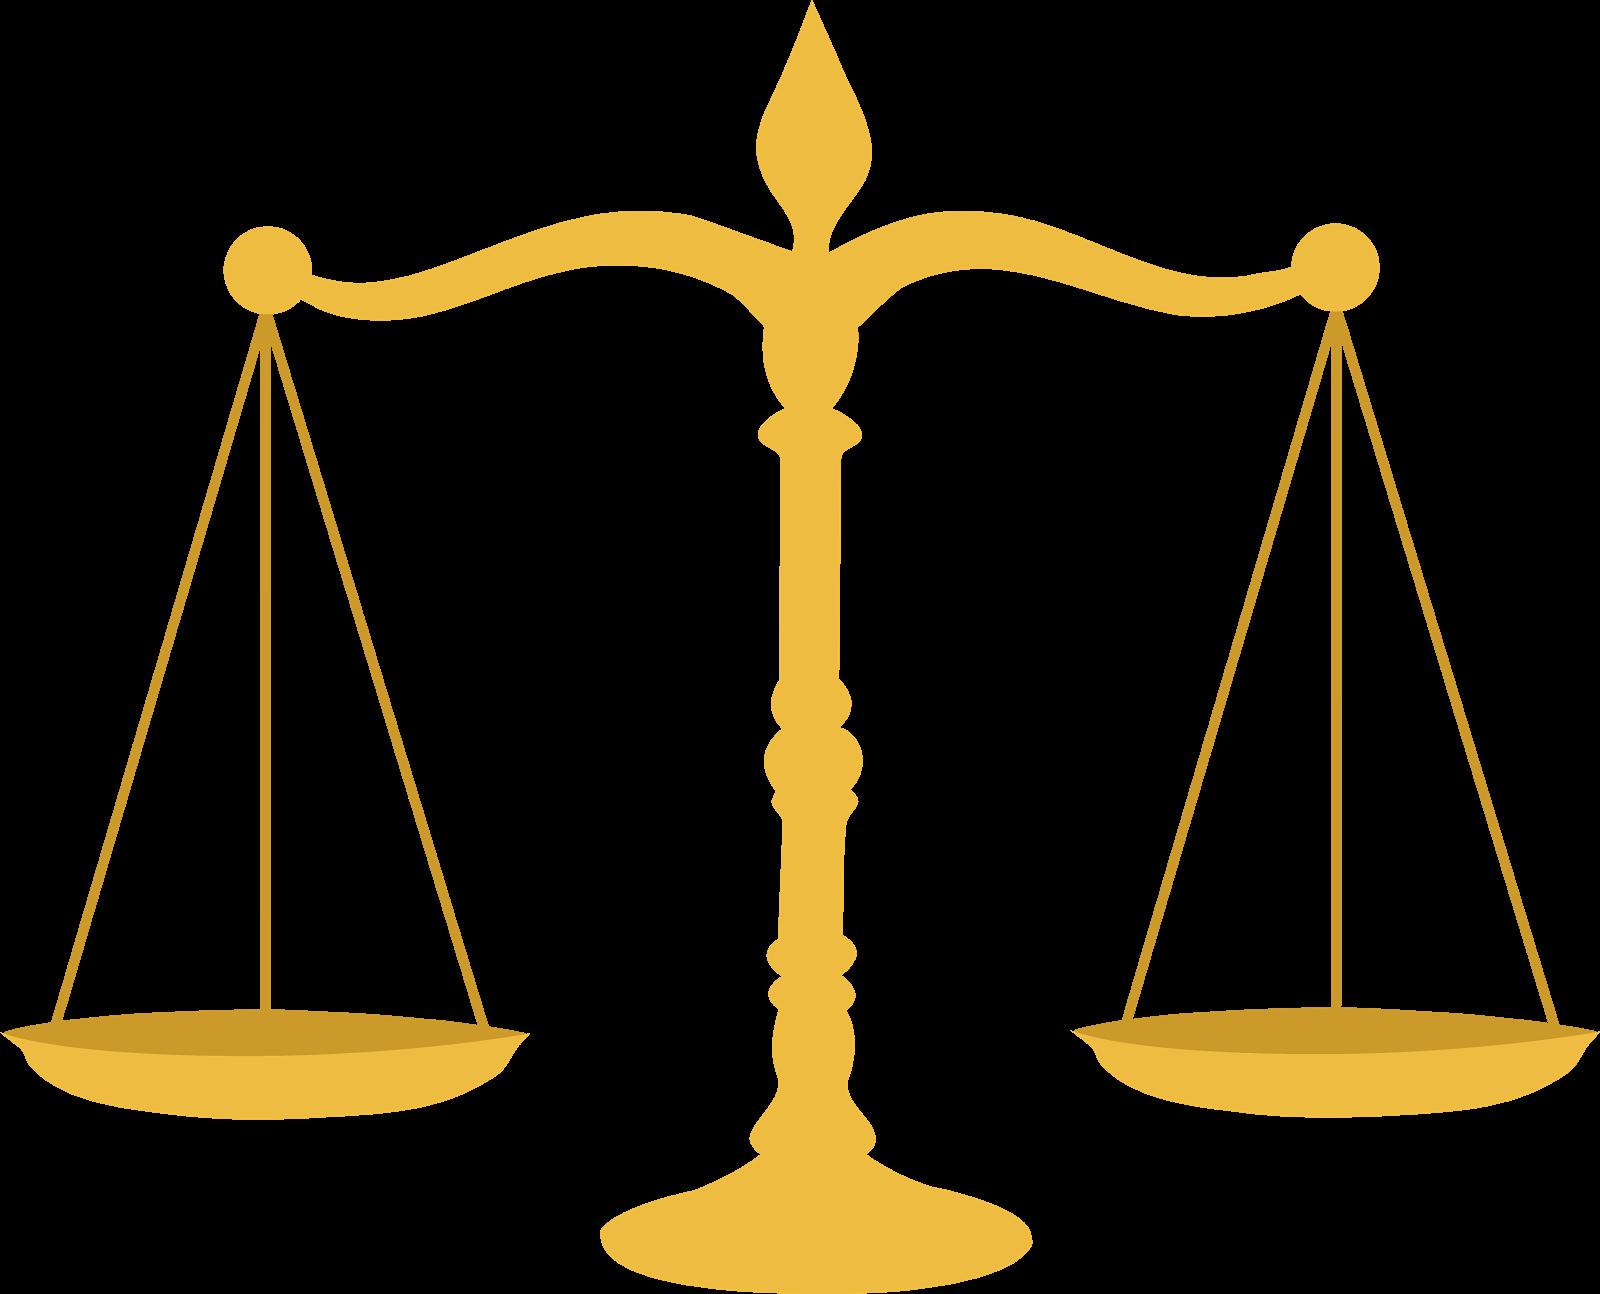 Balance Justice scale, meter, balance, justice, pictures - 3546 - transparentpng